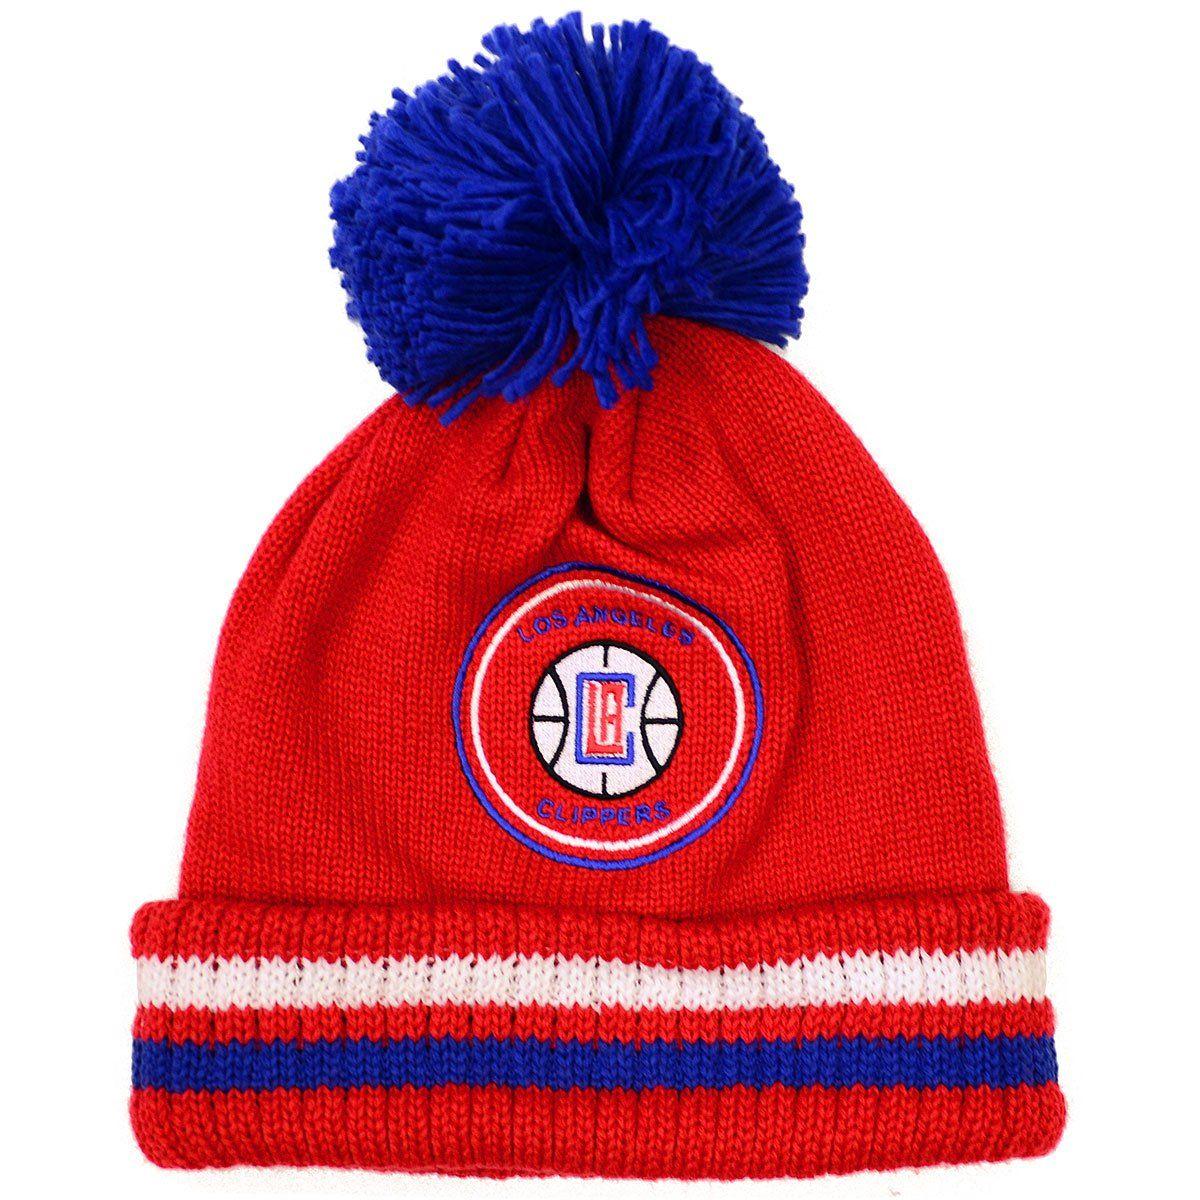 buy online 756e1 35eb7 NBA Mitchell Ness Big Man Hi Five Knit Hat Pom (OSFM, Los Angeles Clippers